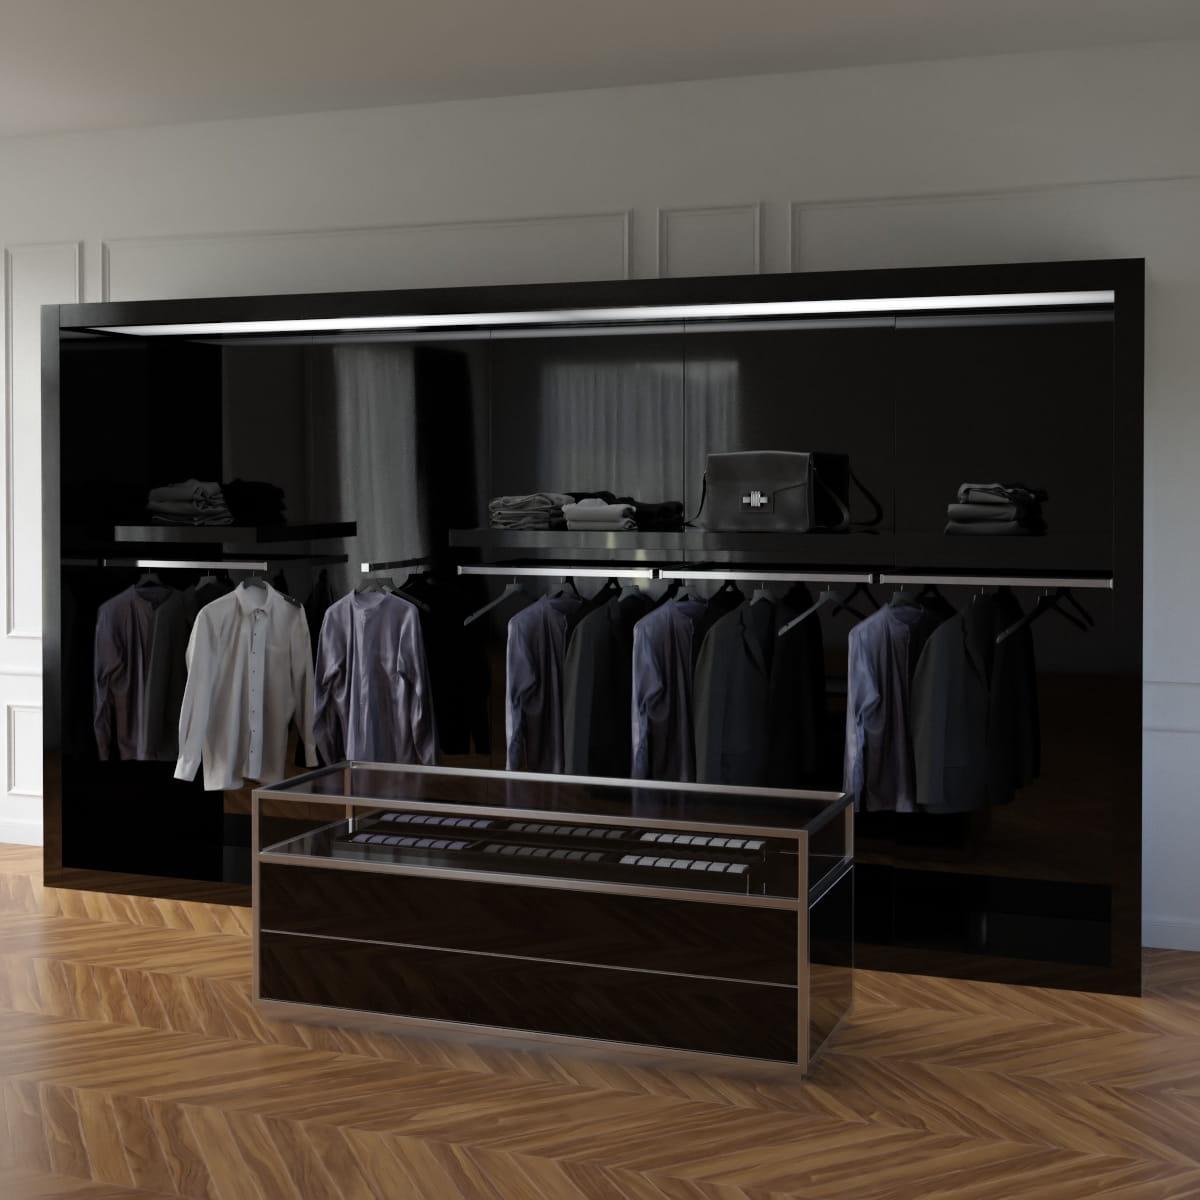 Store fixtures 3 AM216 Archmodels